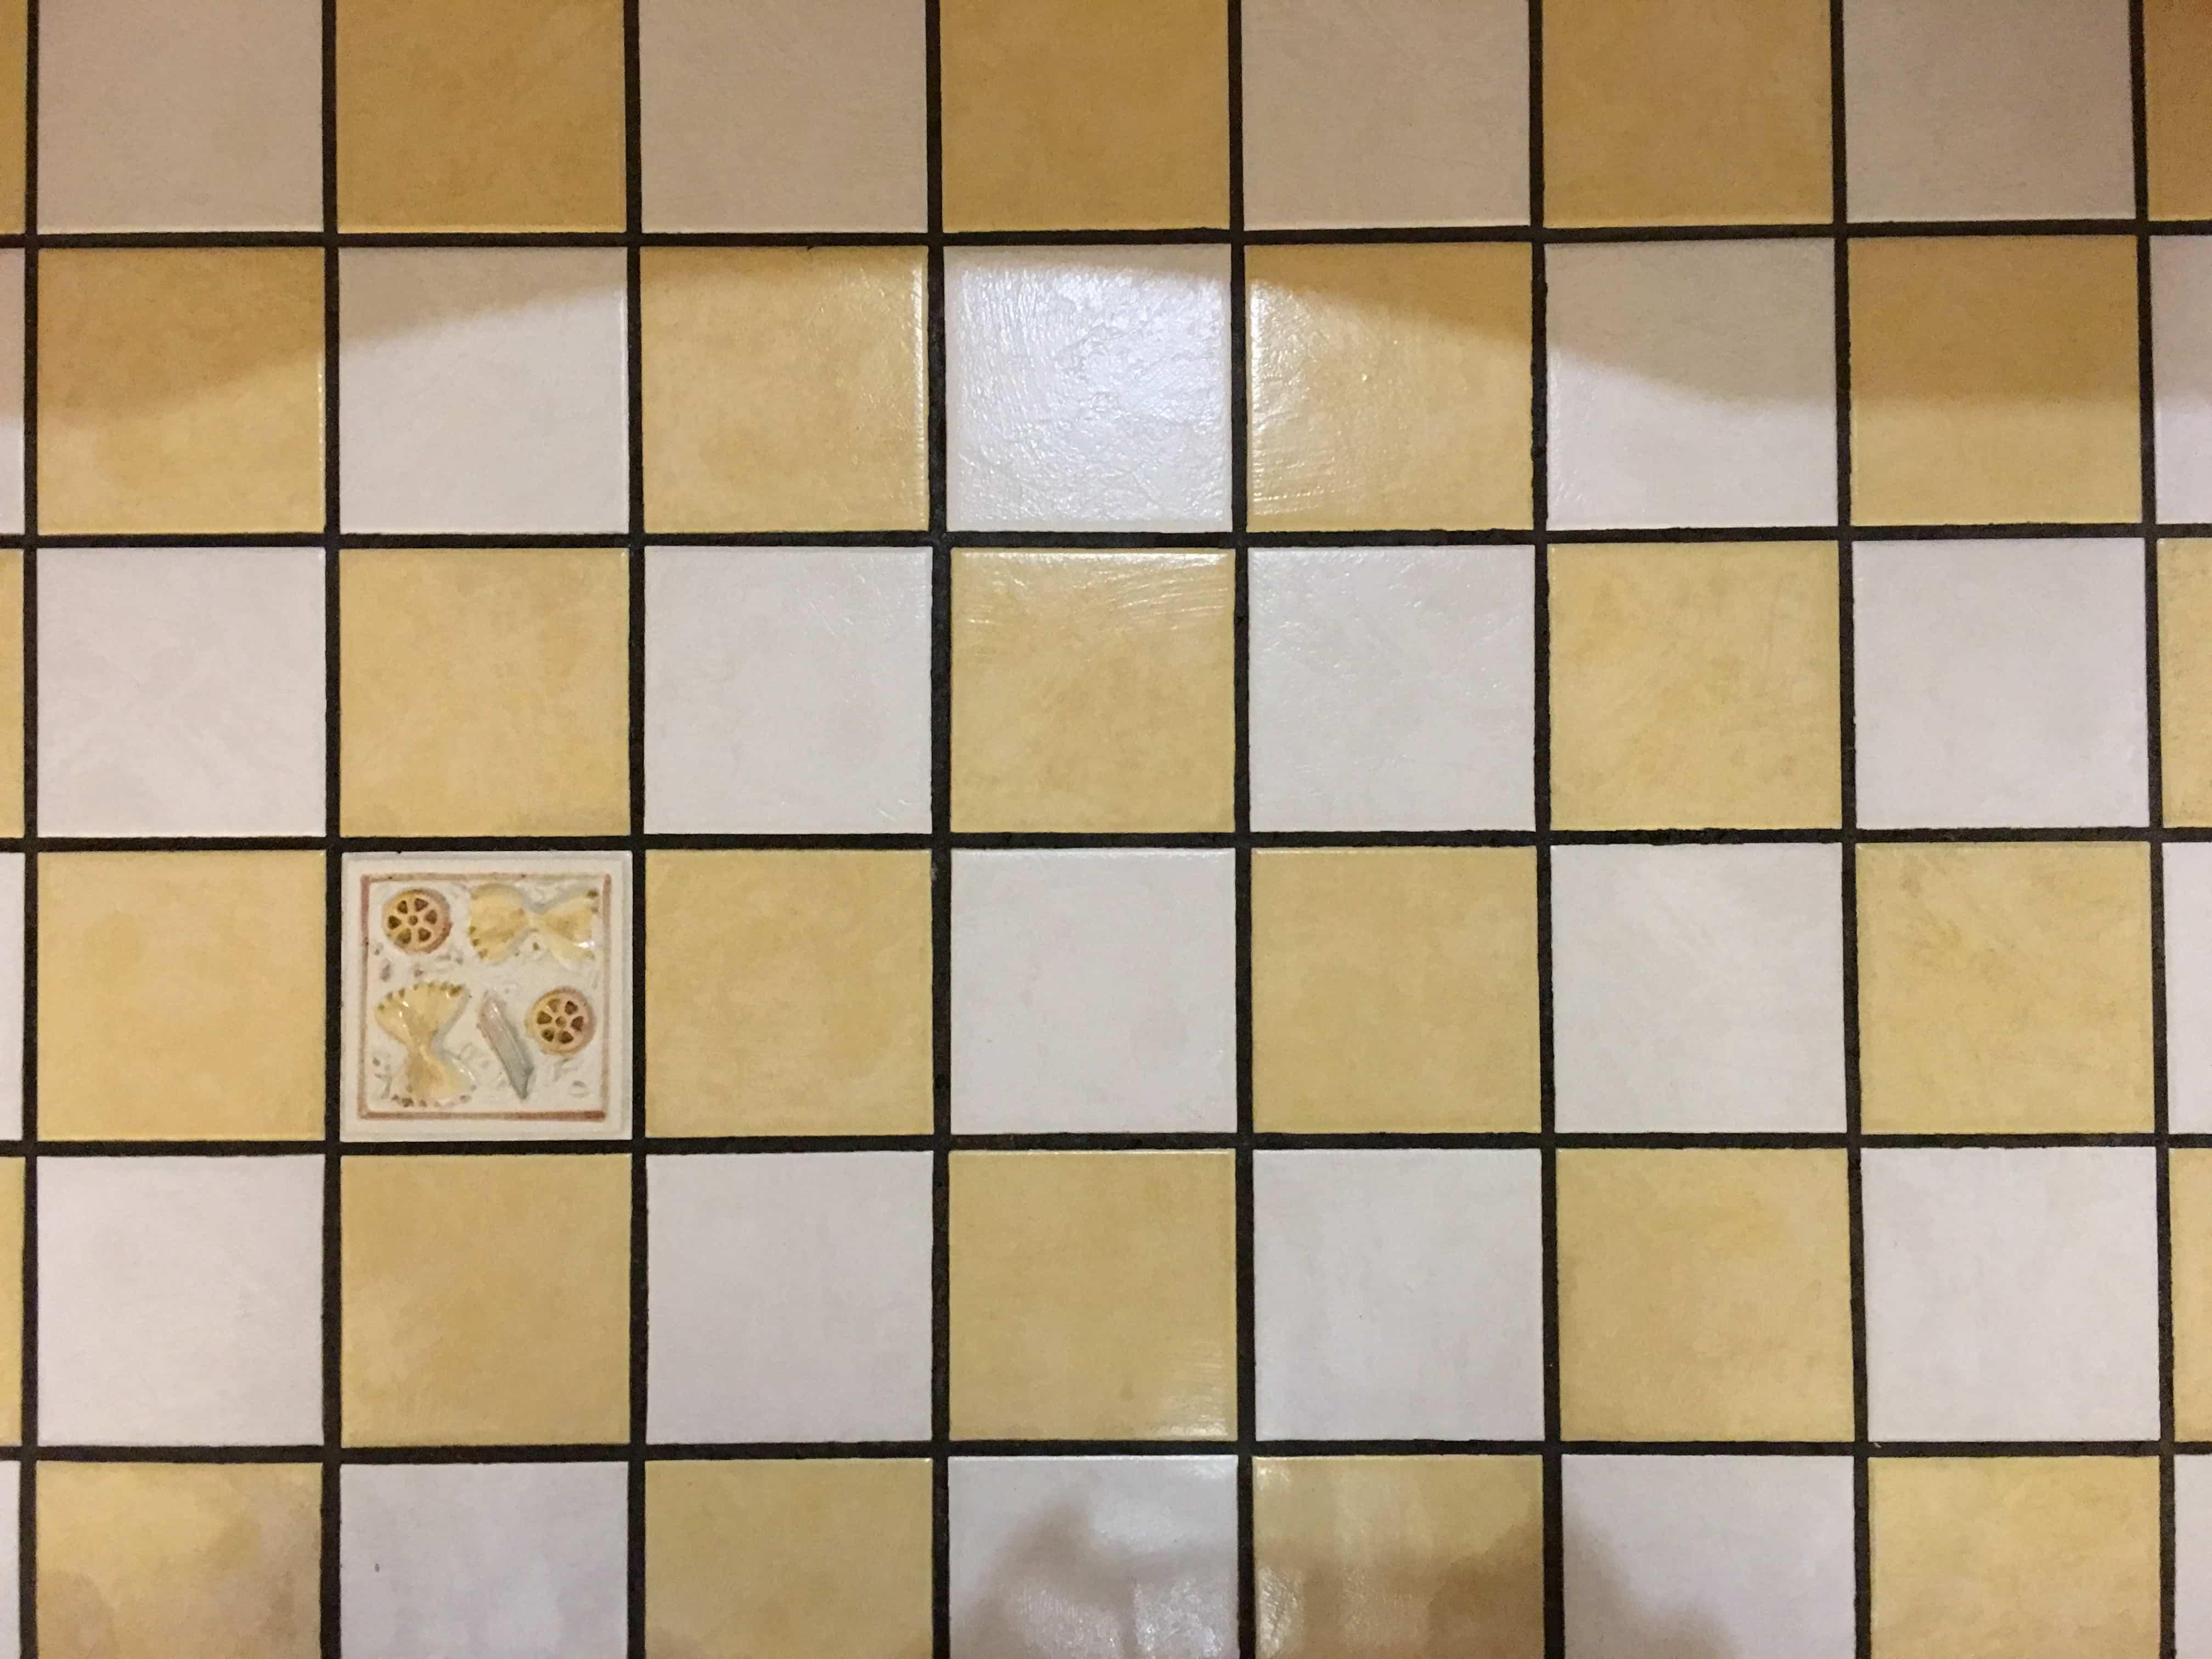 rivestimento cucina 10x10 - 28 images - rivestimento bagno 10x10 ...